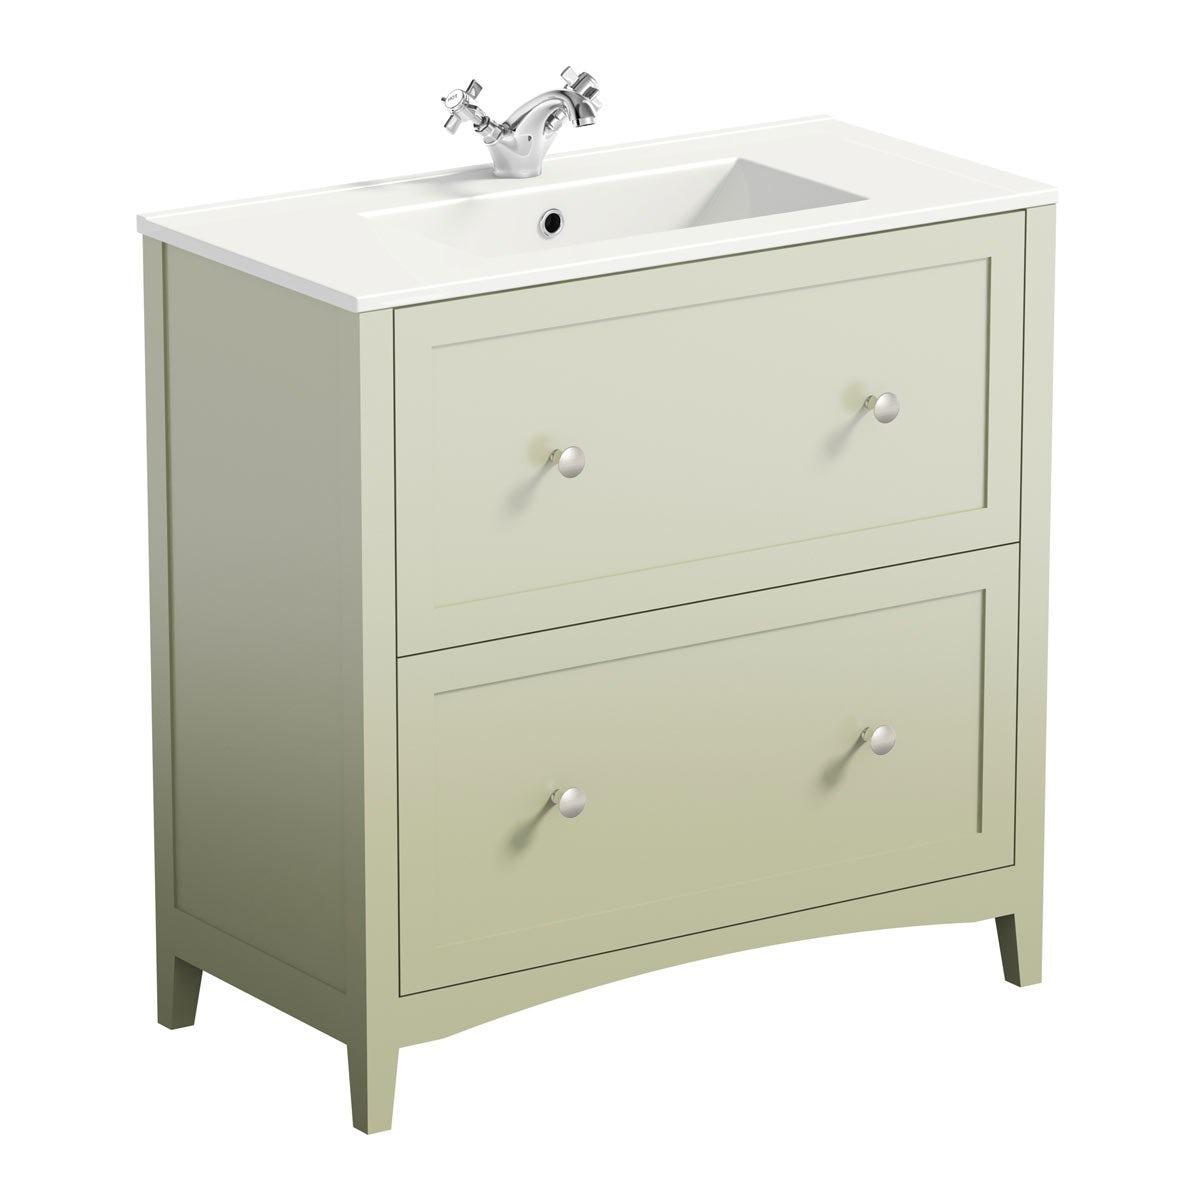 Camberley sage vanity unit basin 800mm. The Bath Co Vanity Units   VictoriaPlum com